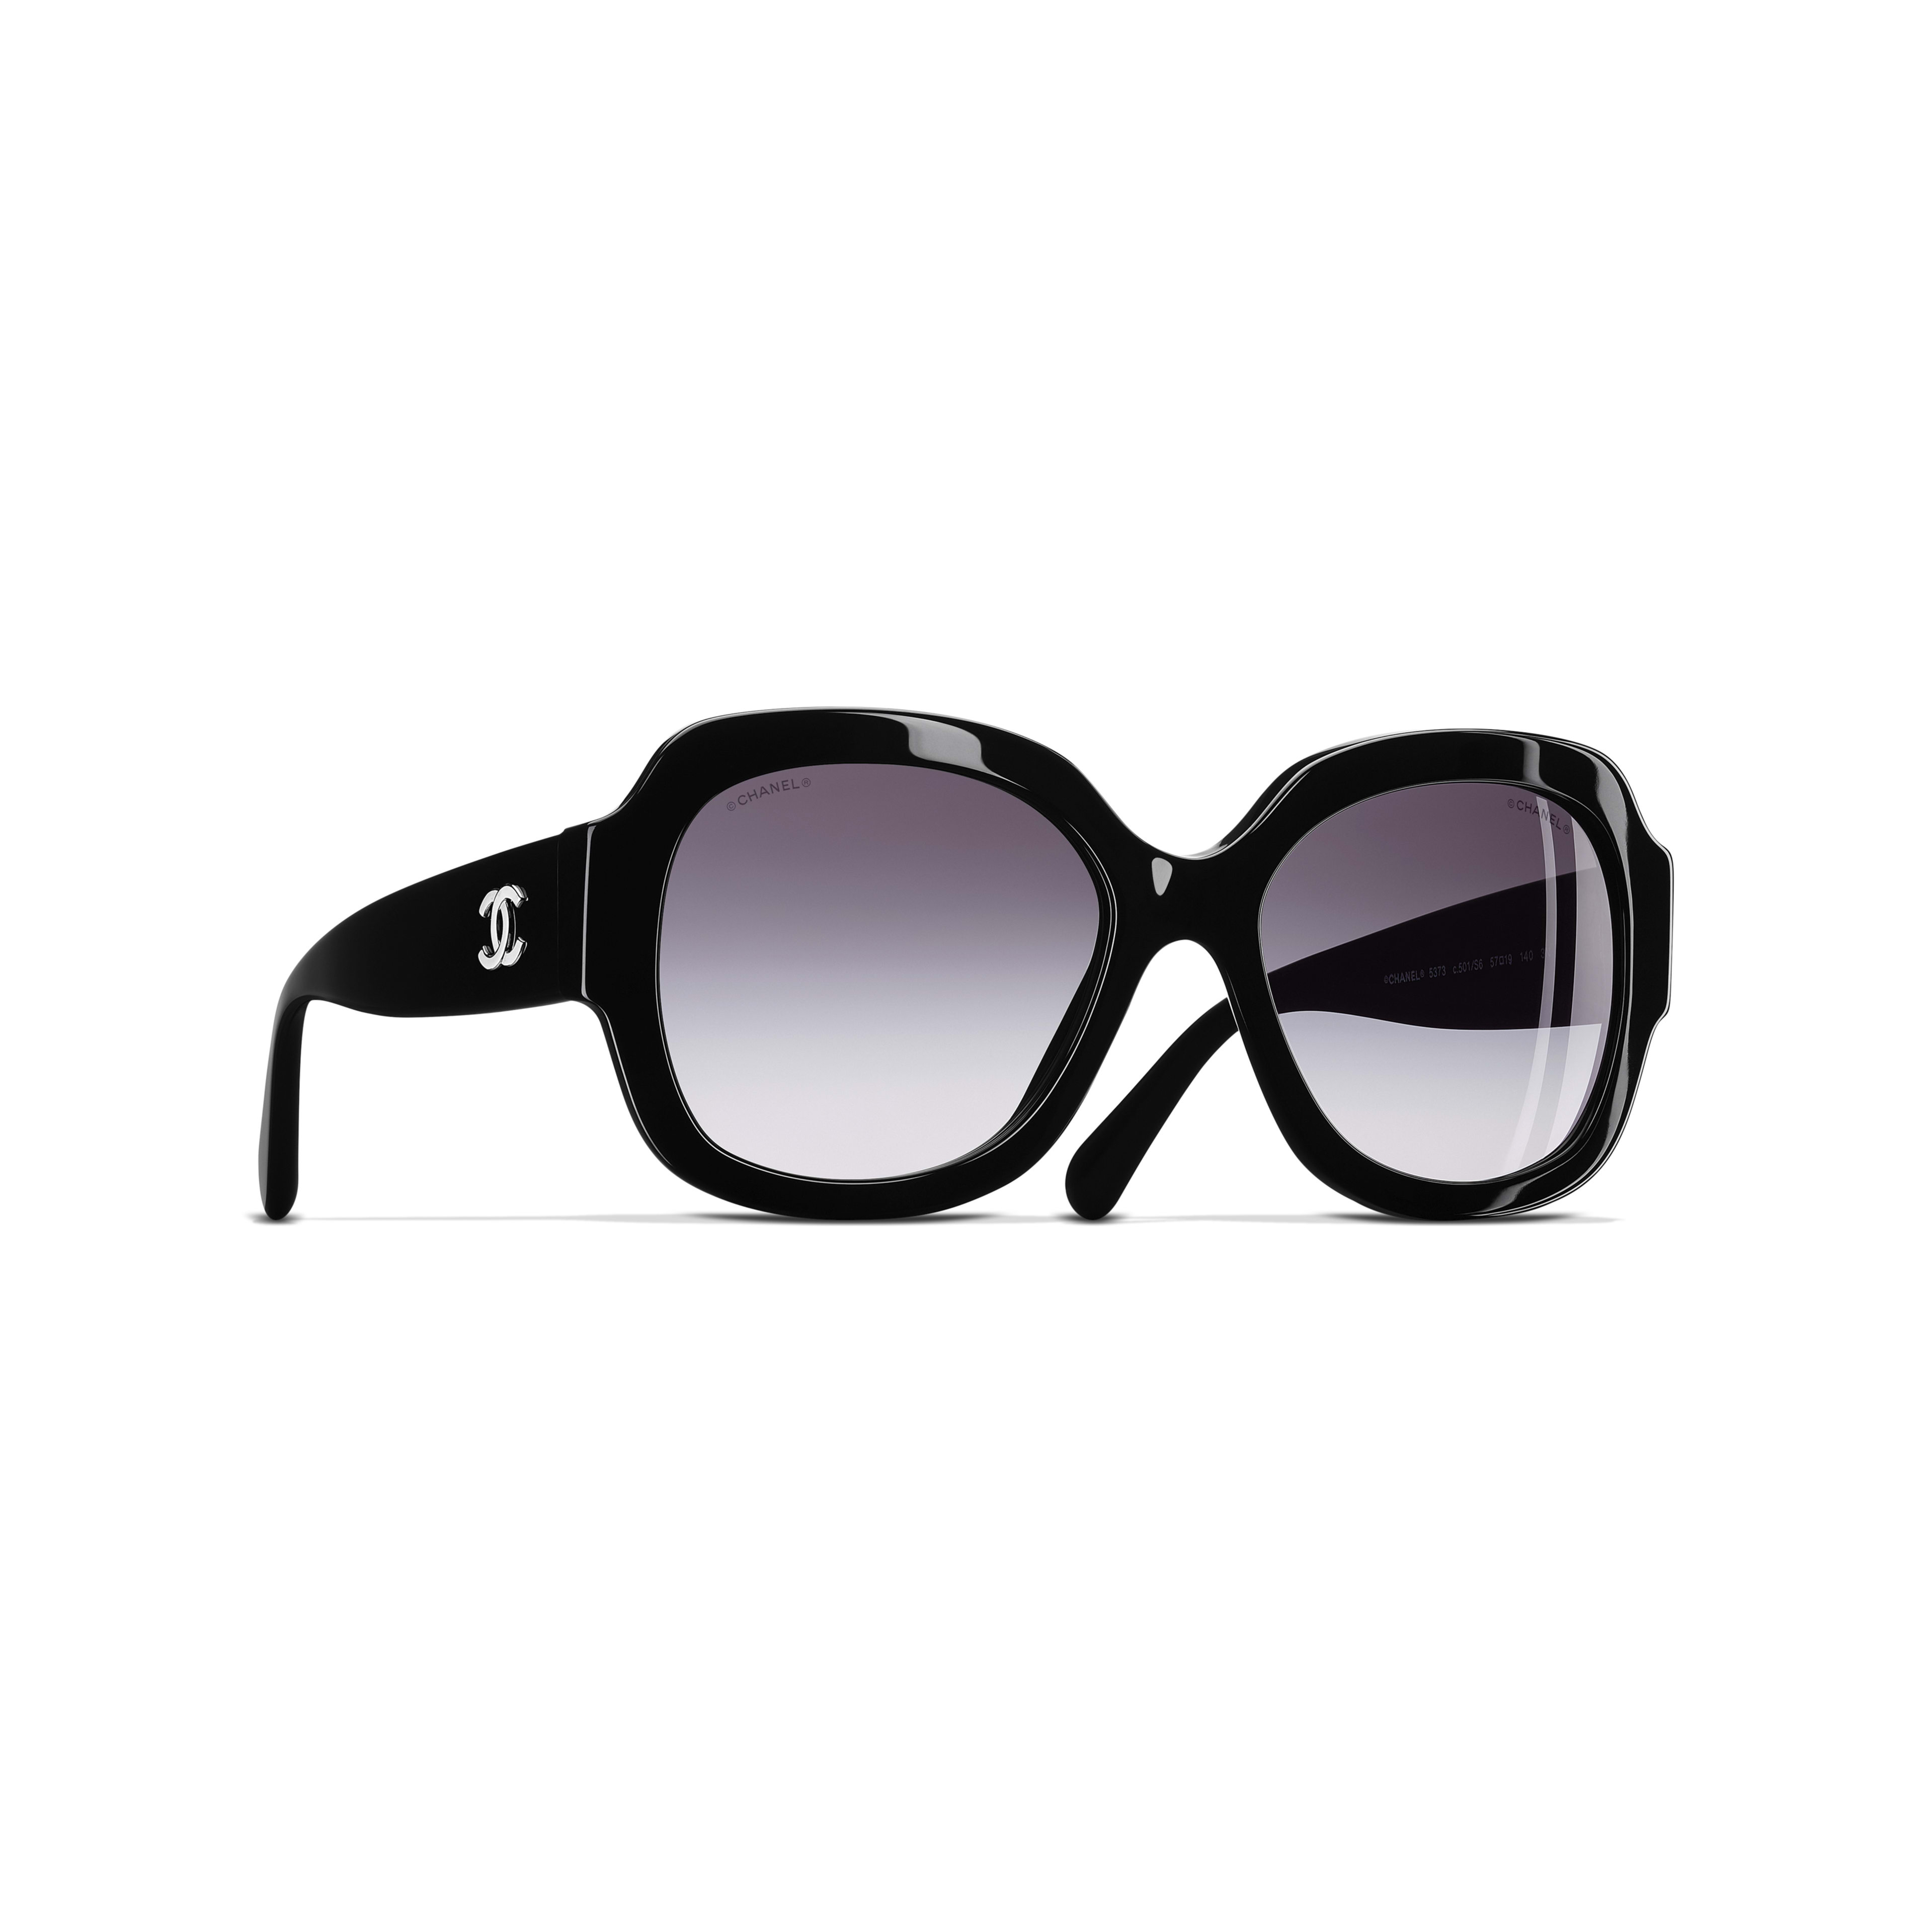 Square Sunglasses - Black - Acetate - Default view - see standard sized version